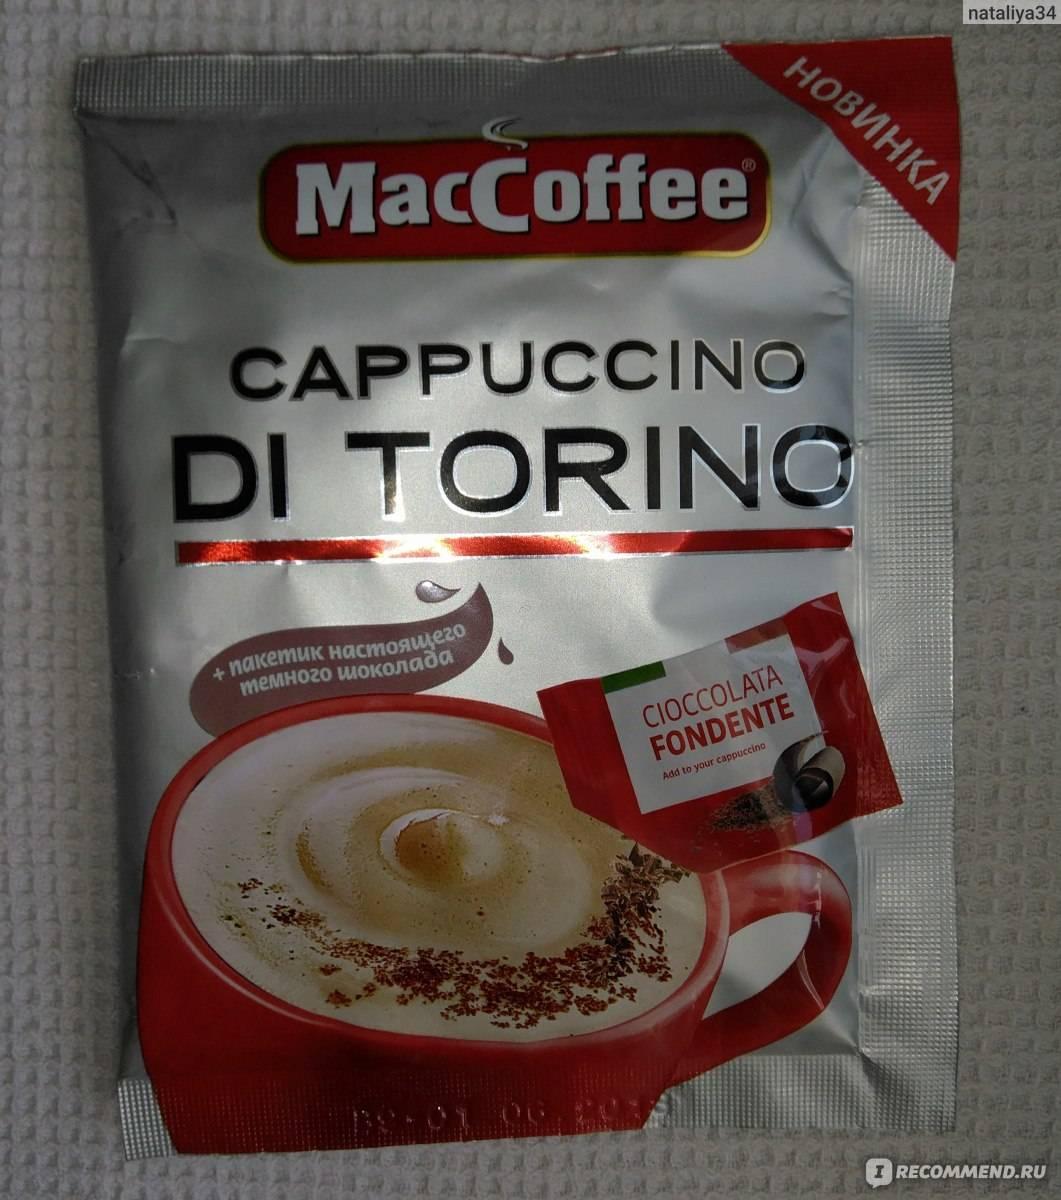 Кофе по-турински bicerin рецепт с фото пошагово - 1000.menu